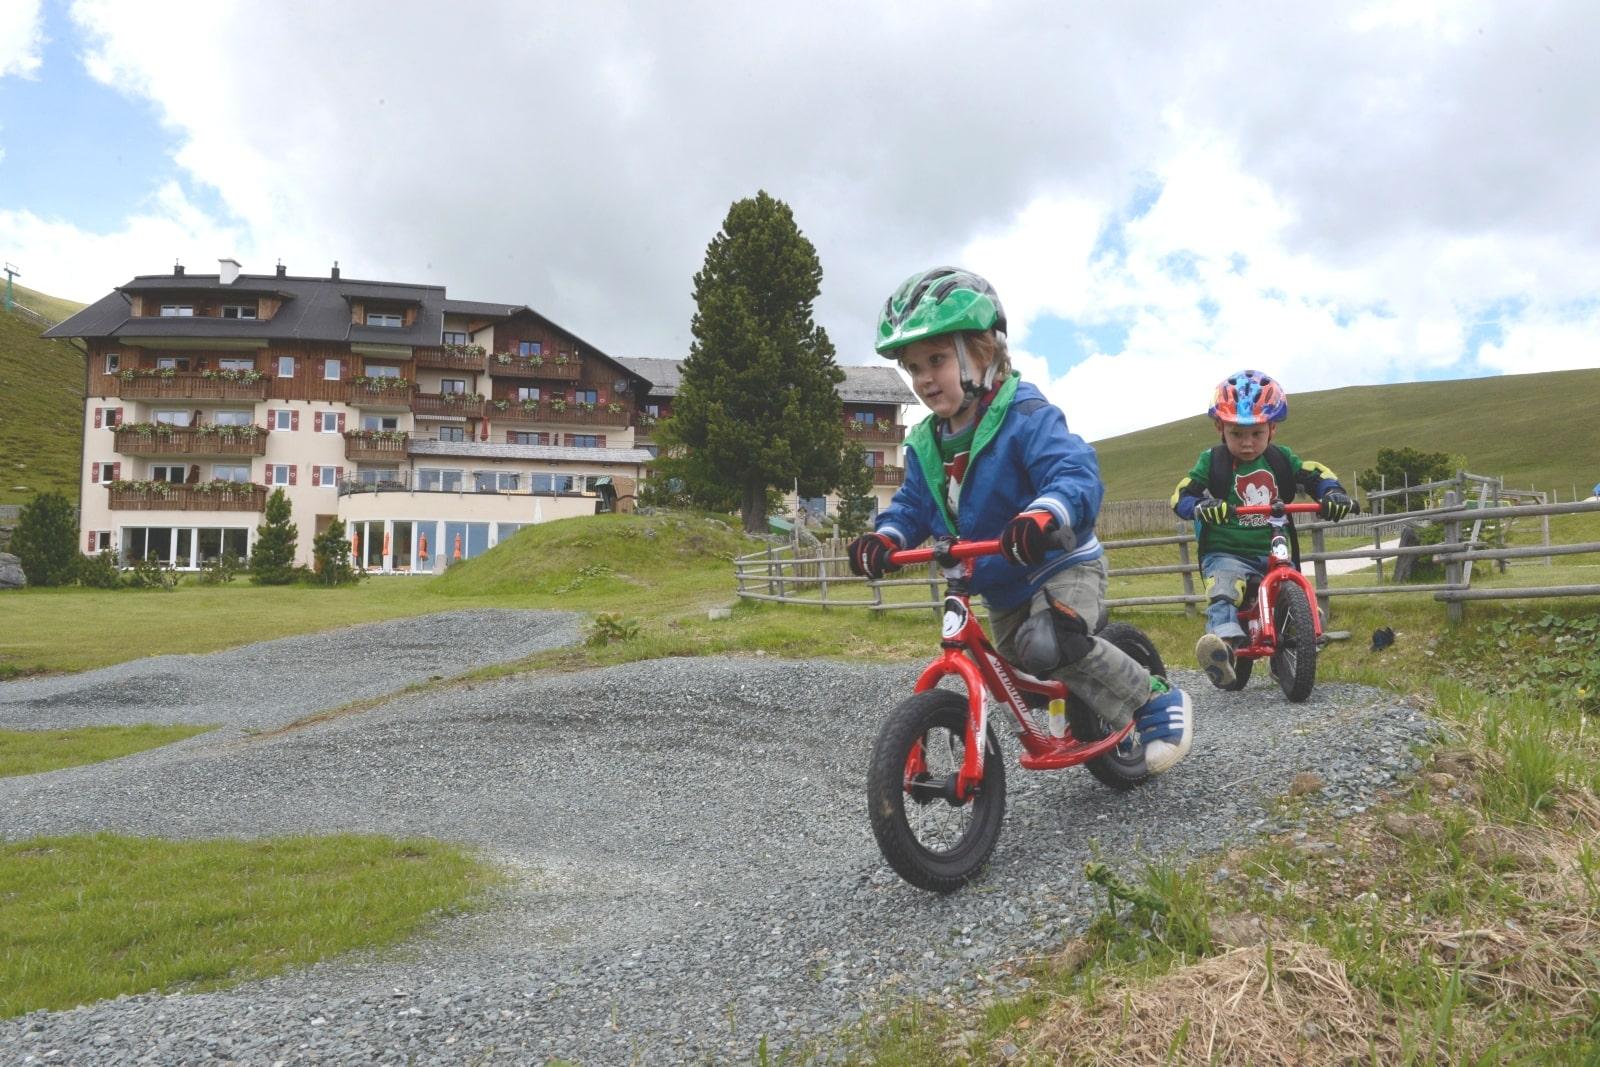 Heidi-Chalet-Falkert-Heidialm-Falkertsee-Kinder-Biken-Fahrrad